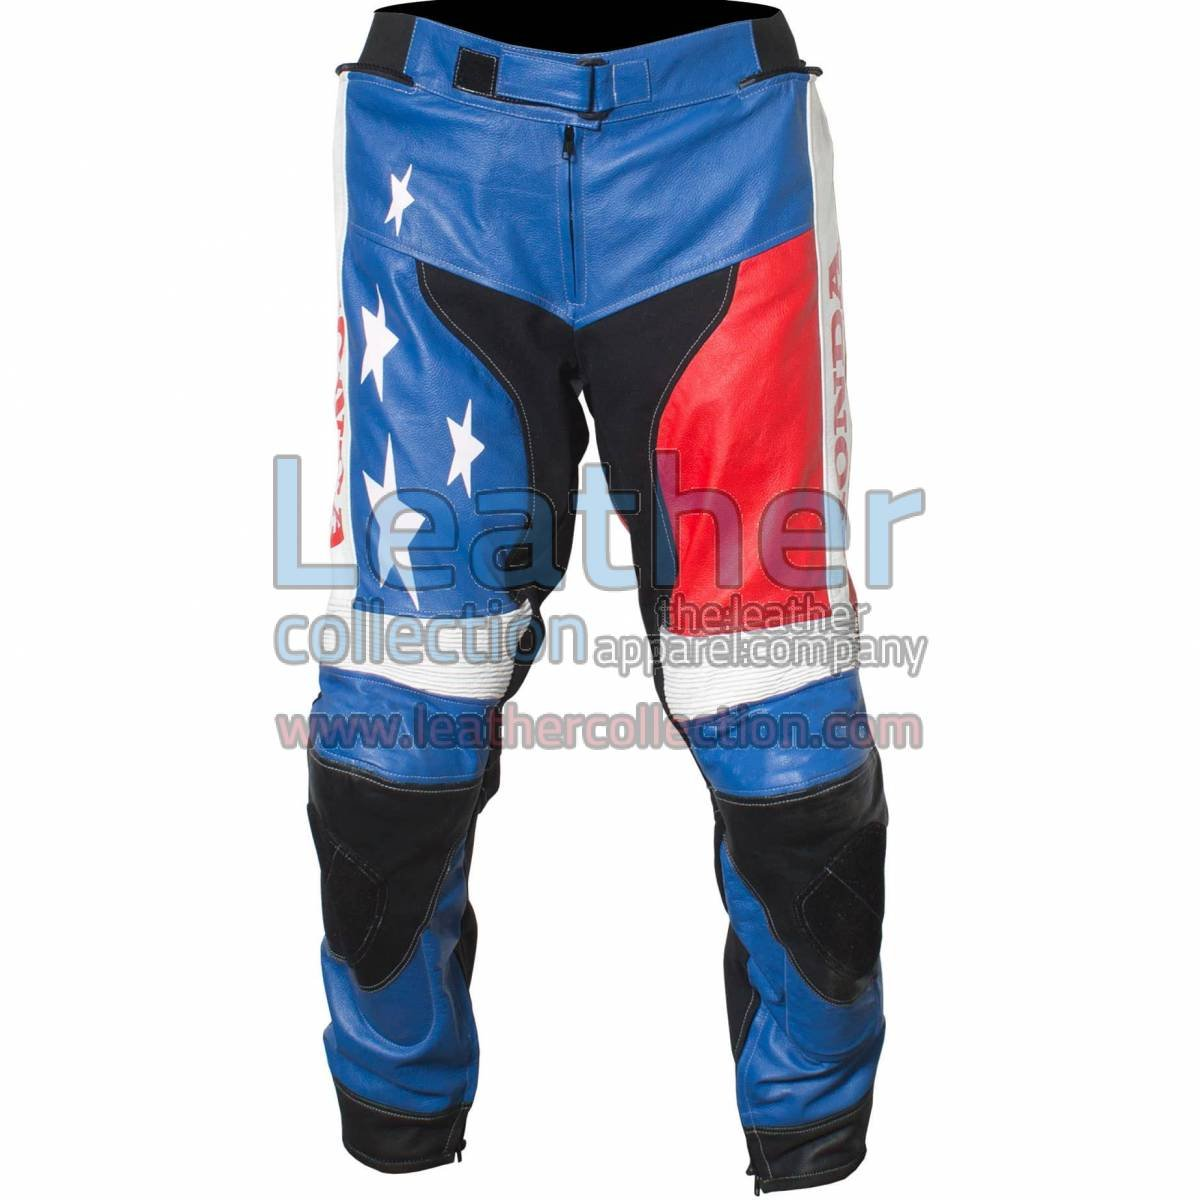 American Honda Moto2 Moriwaki MD600 Leather Pants